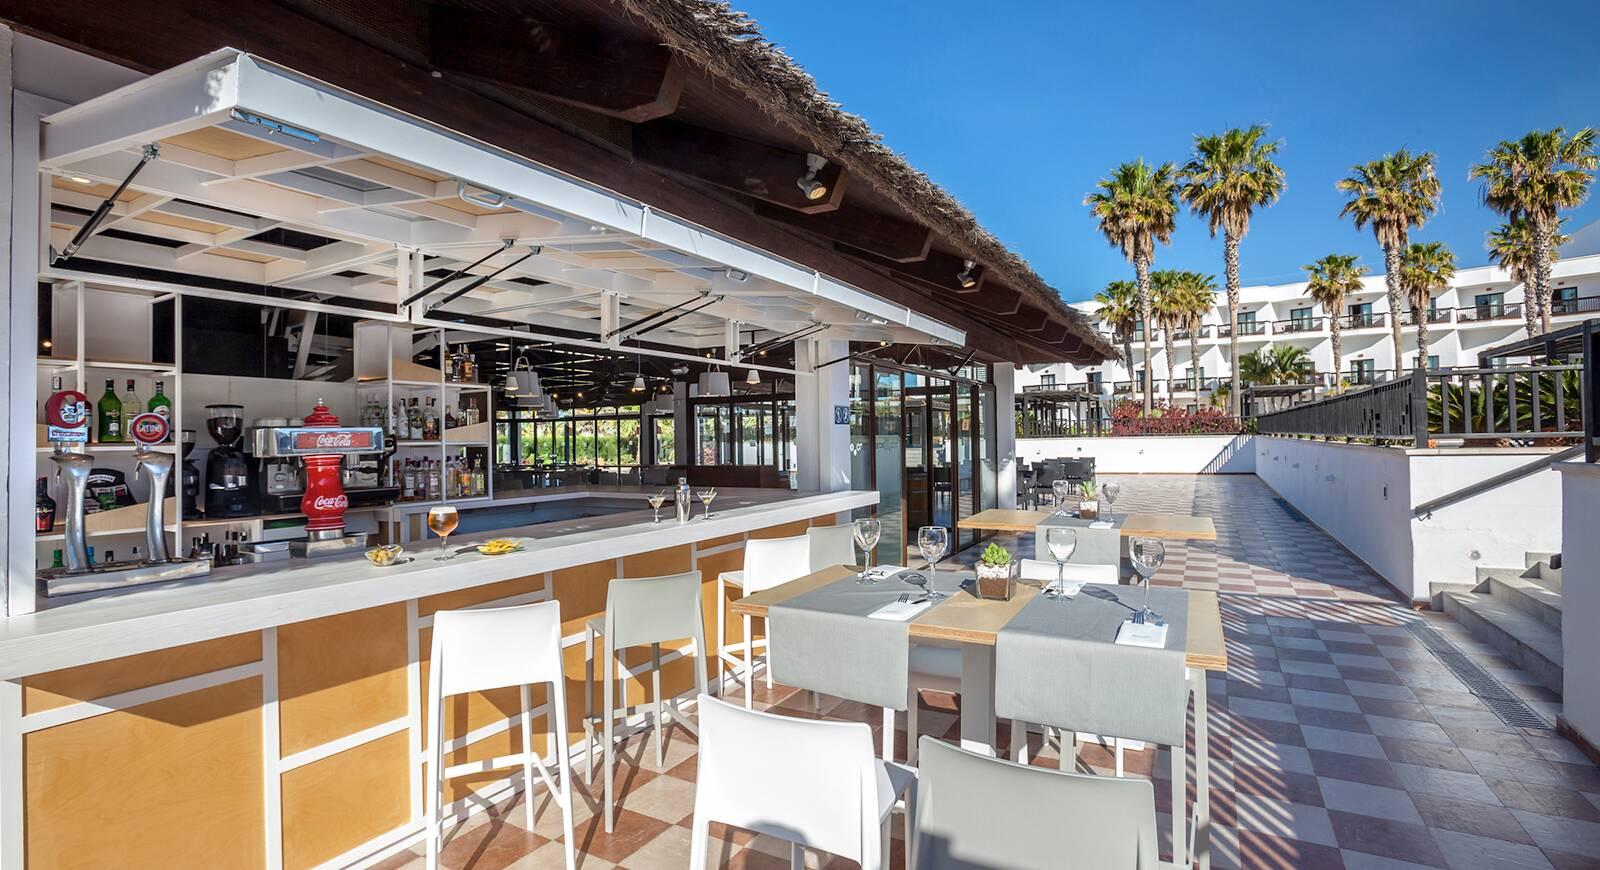 236-restaurant-120-hotel-barcelo-cabo-de-gata_tcm20-136683_w1600_h870_n.jpg